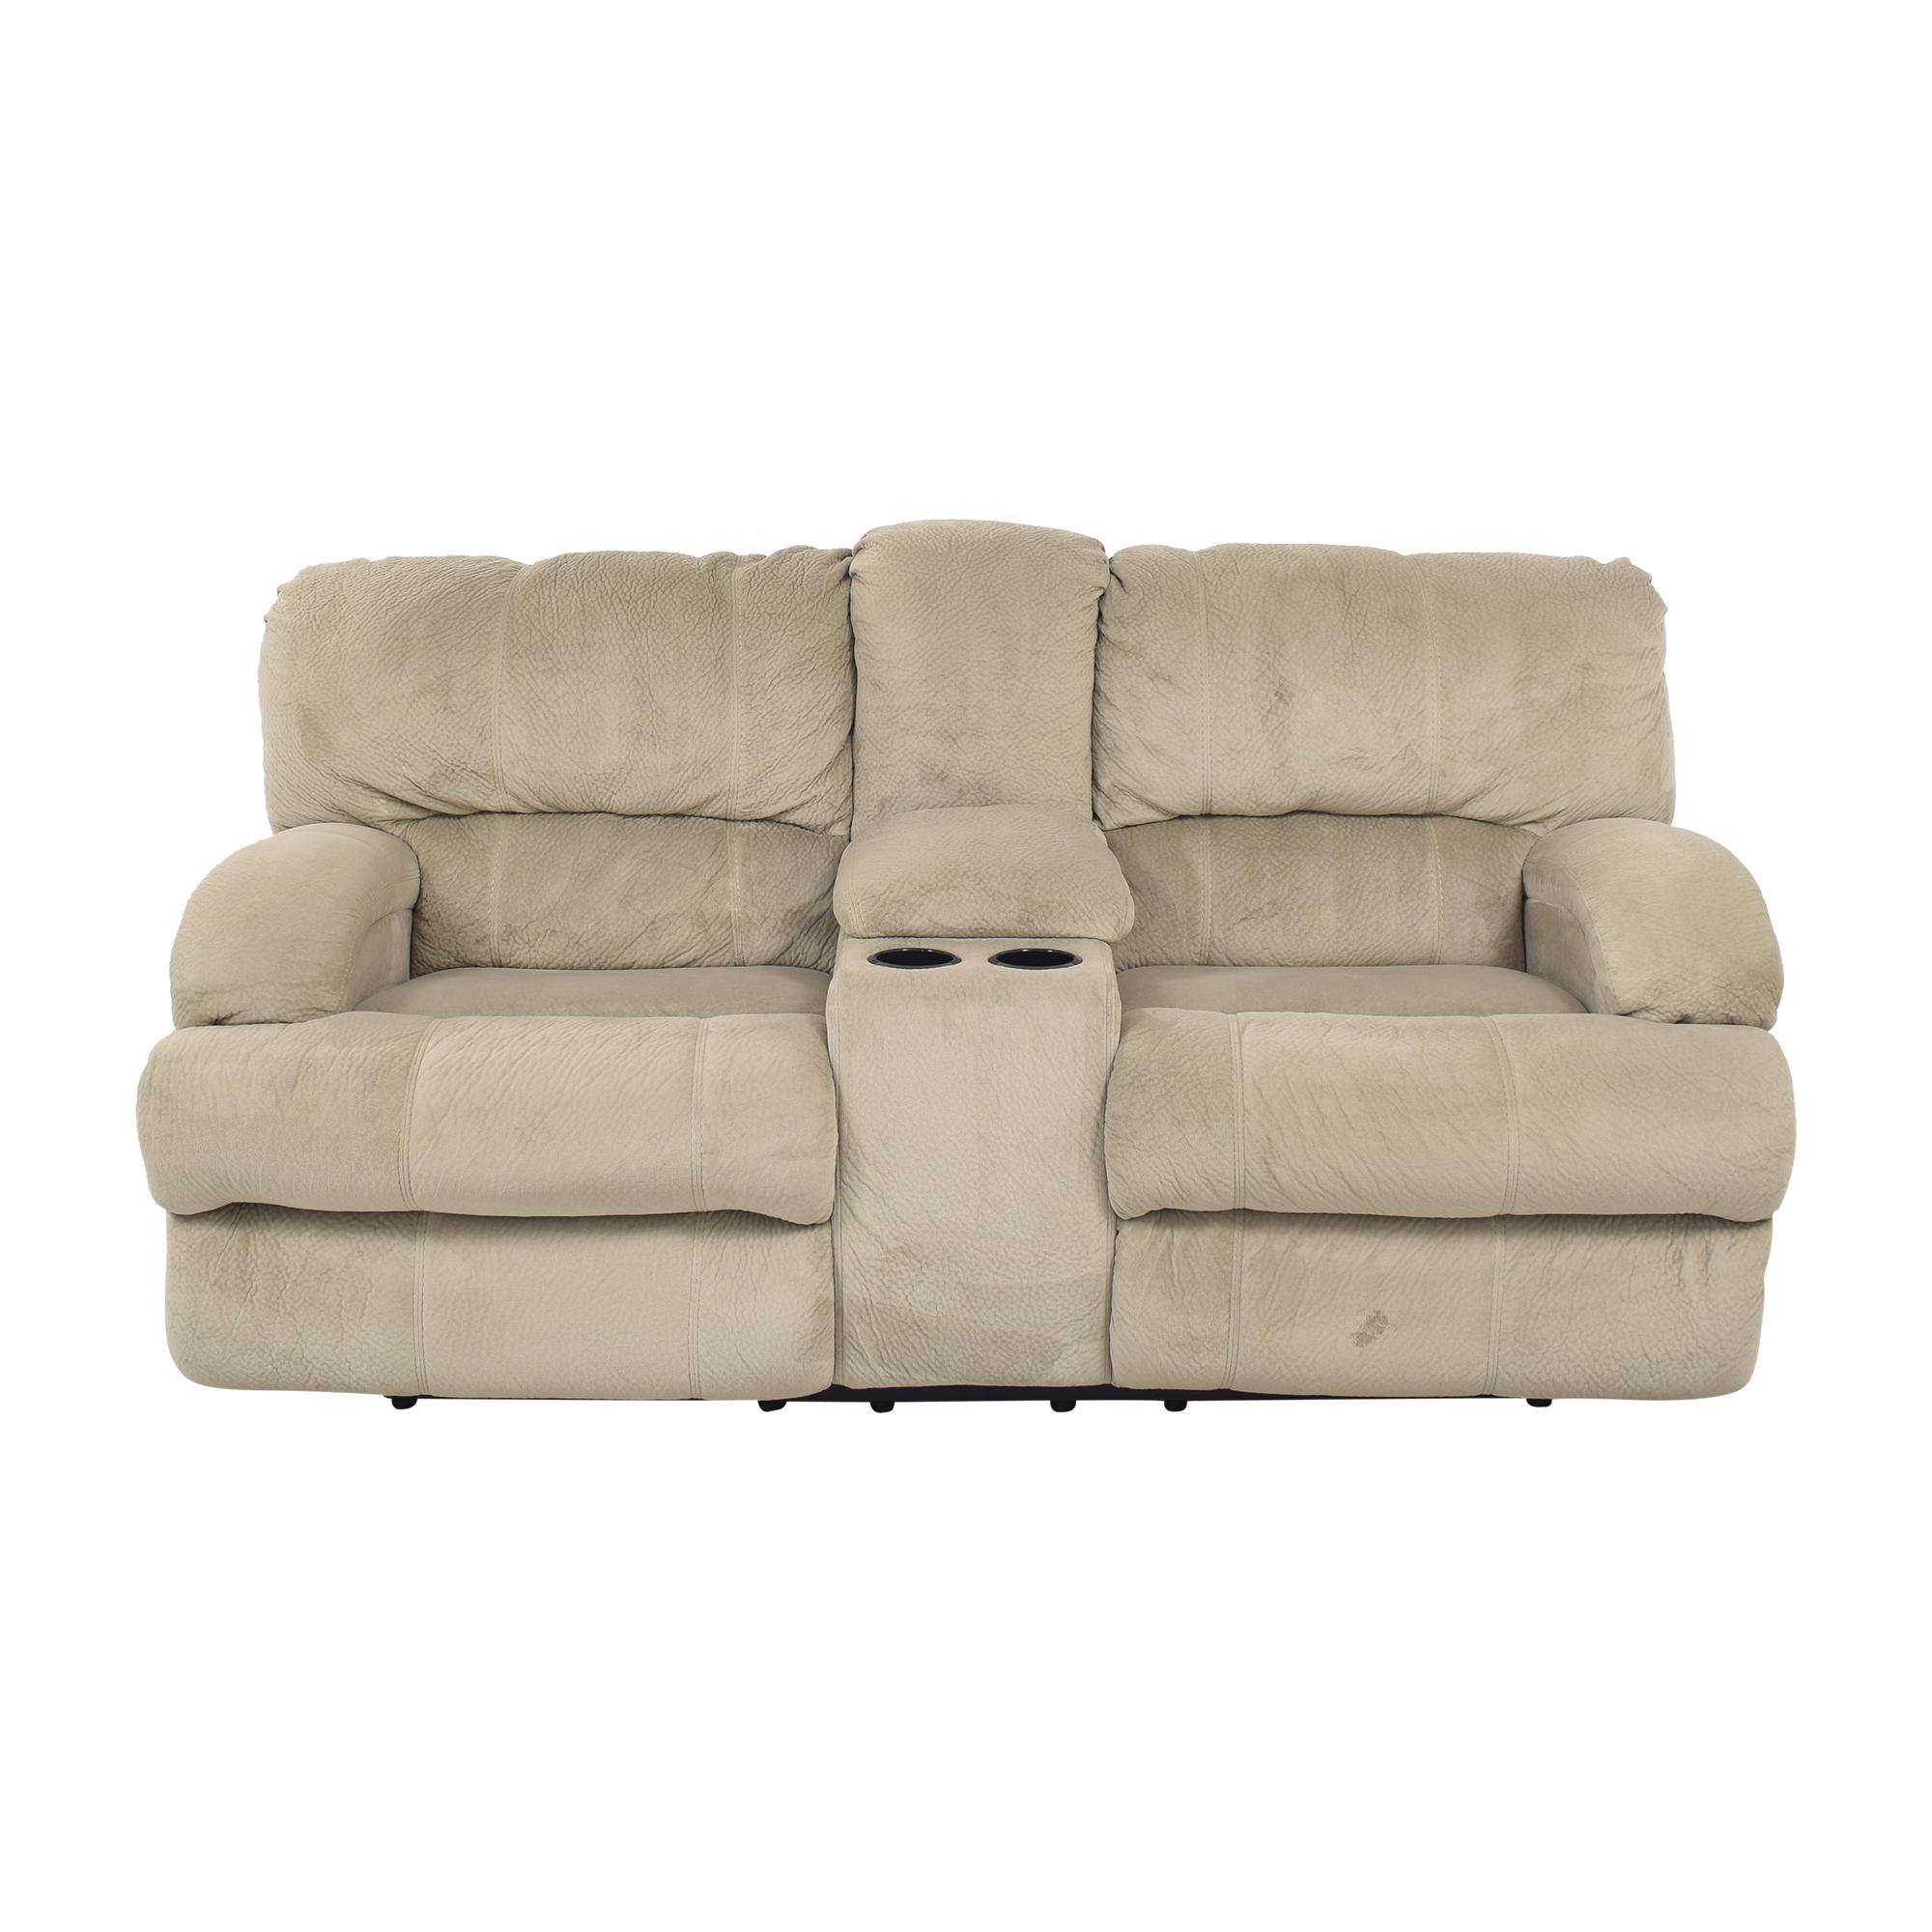 77 off raymour flanigan raymour flanigan microfiber reclining sofa sofas